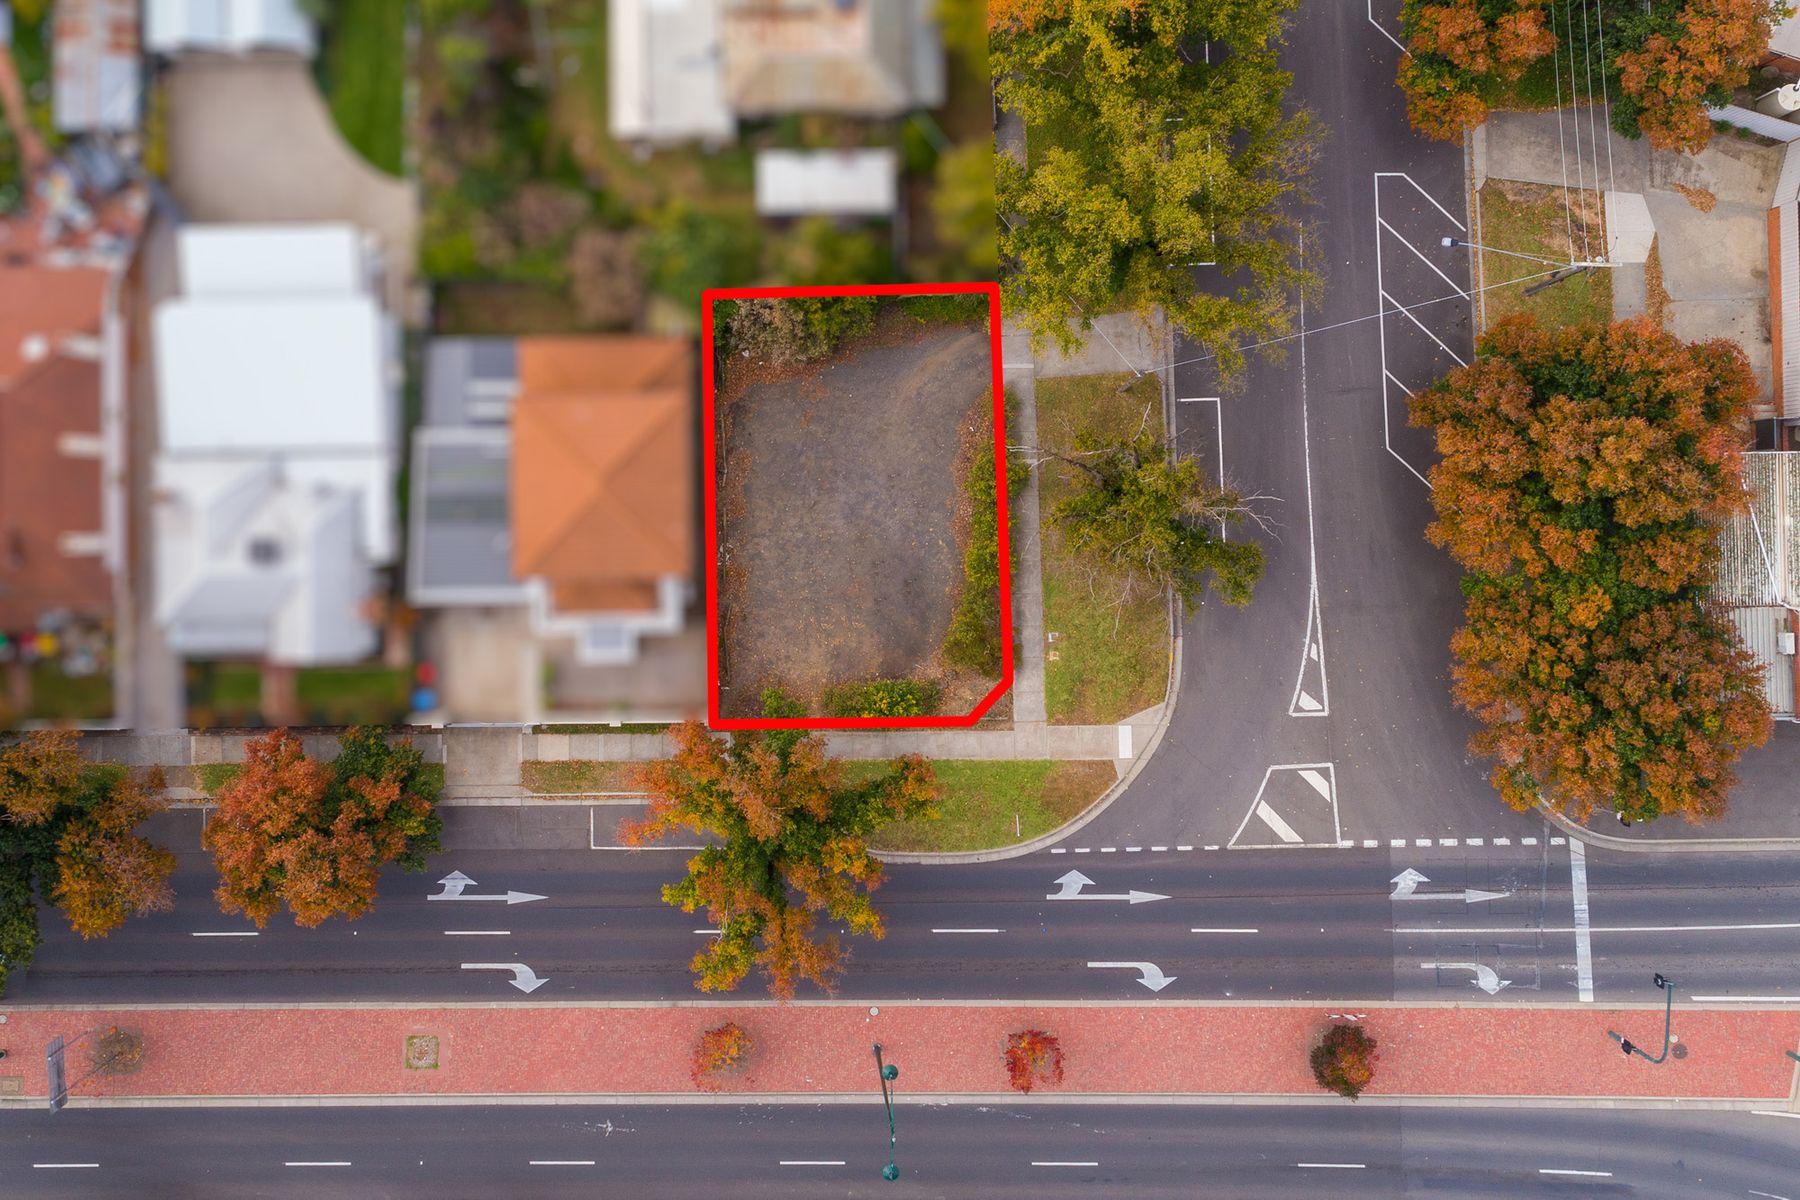 Lot 2 Corner Chapel Street & Larritt Street, Bendigo, VIC 3550